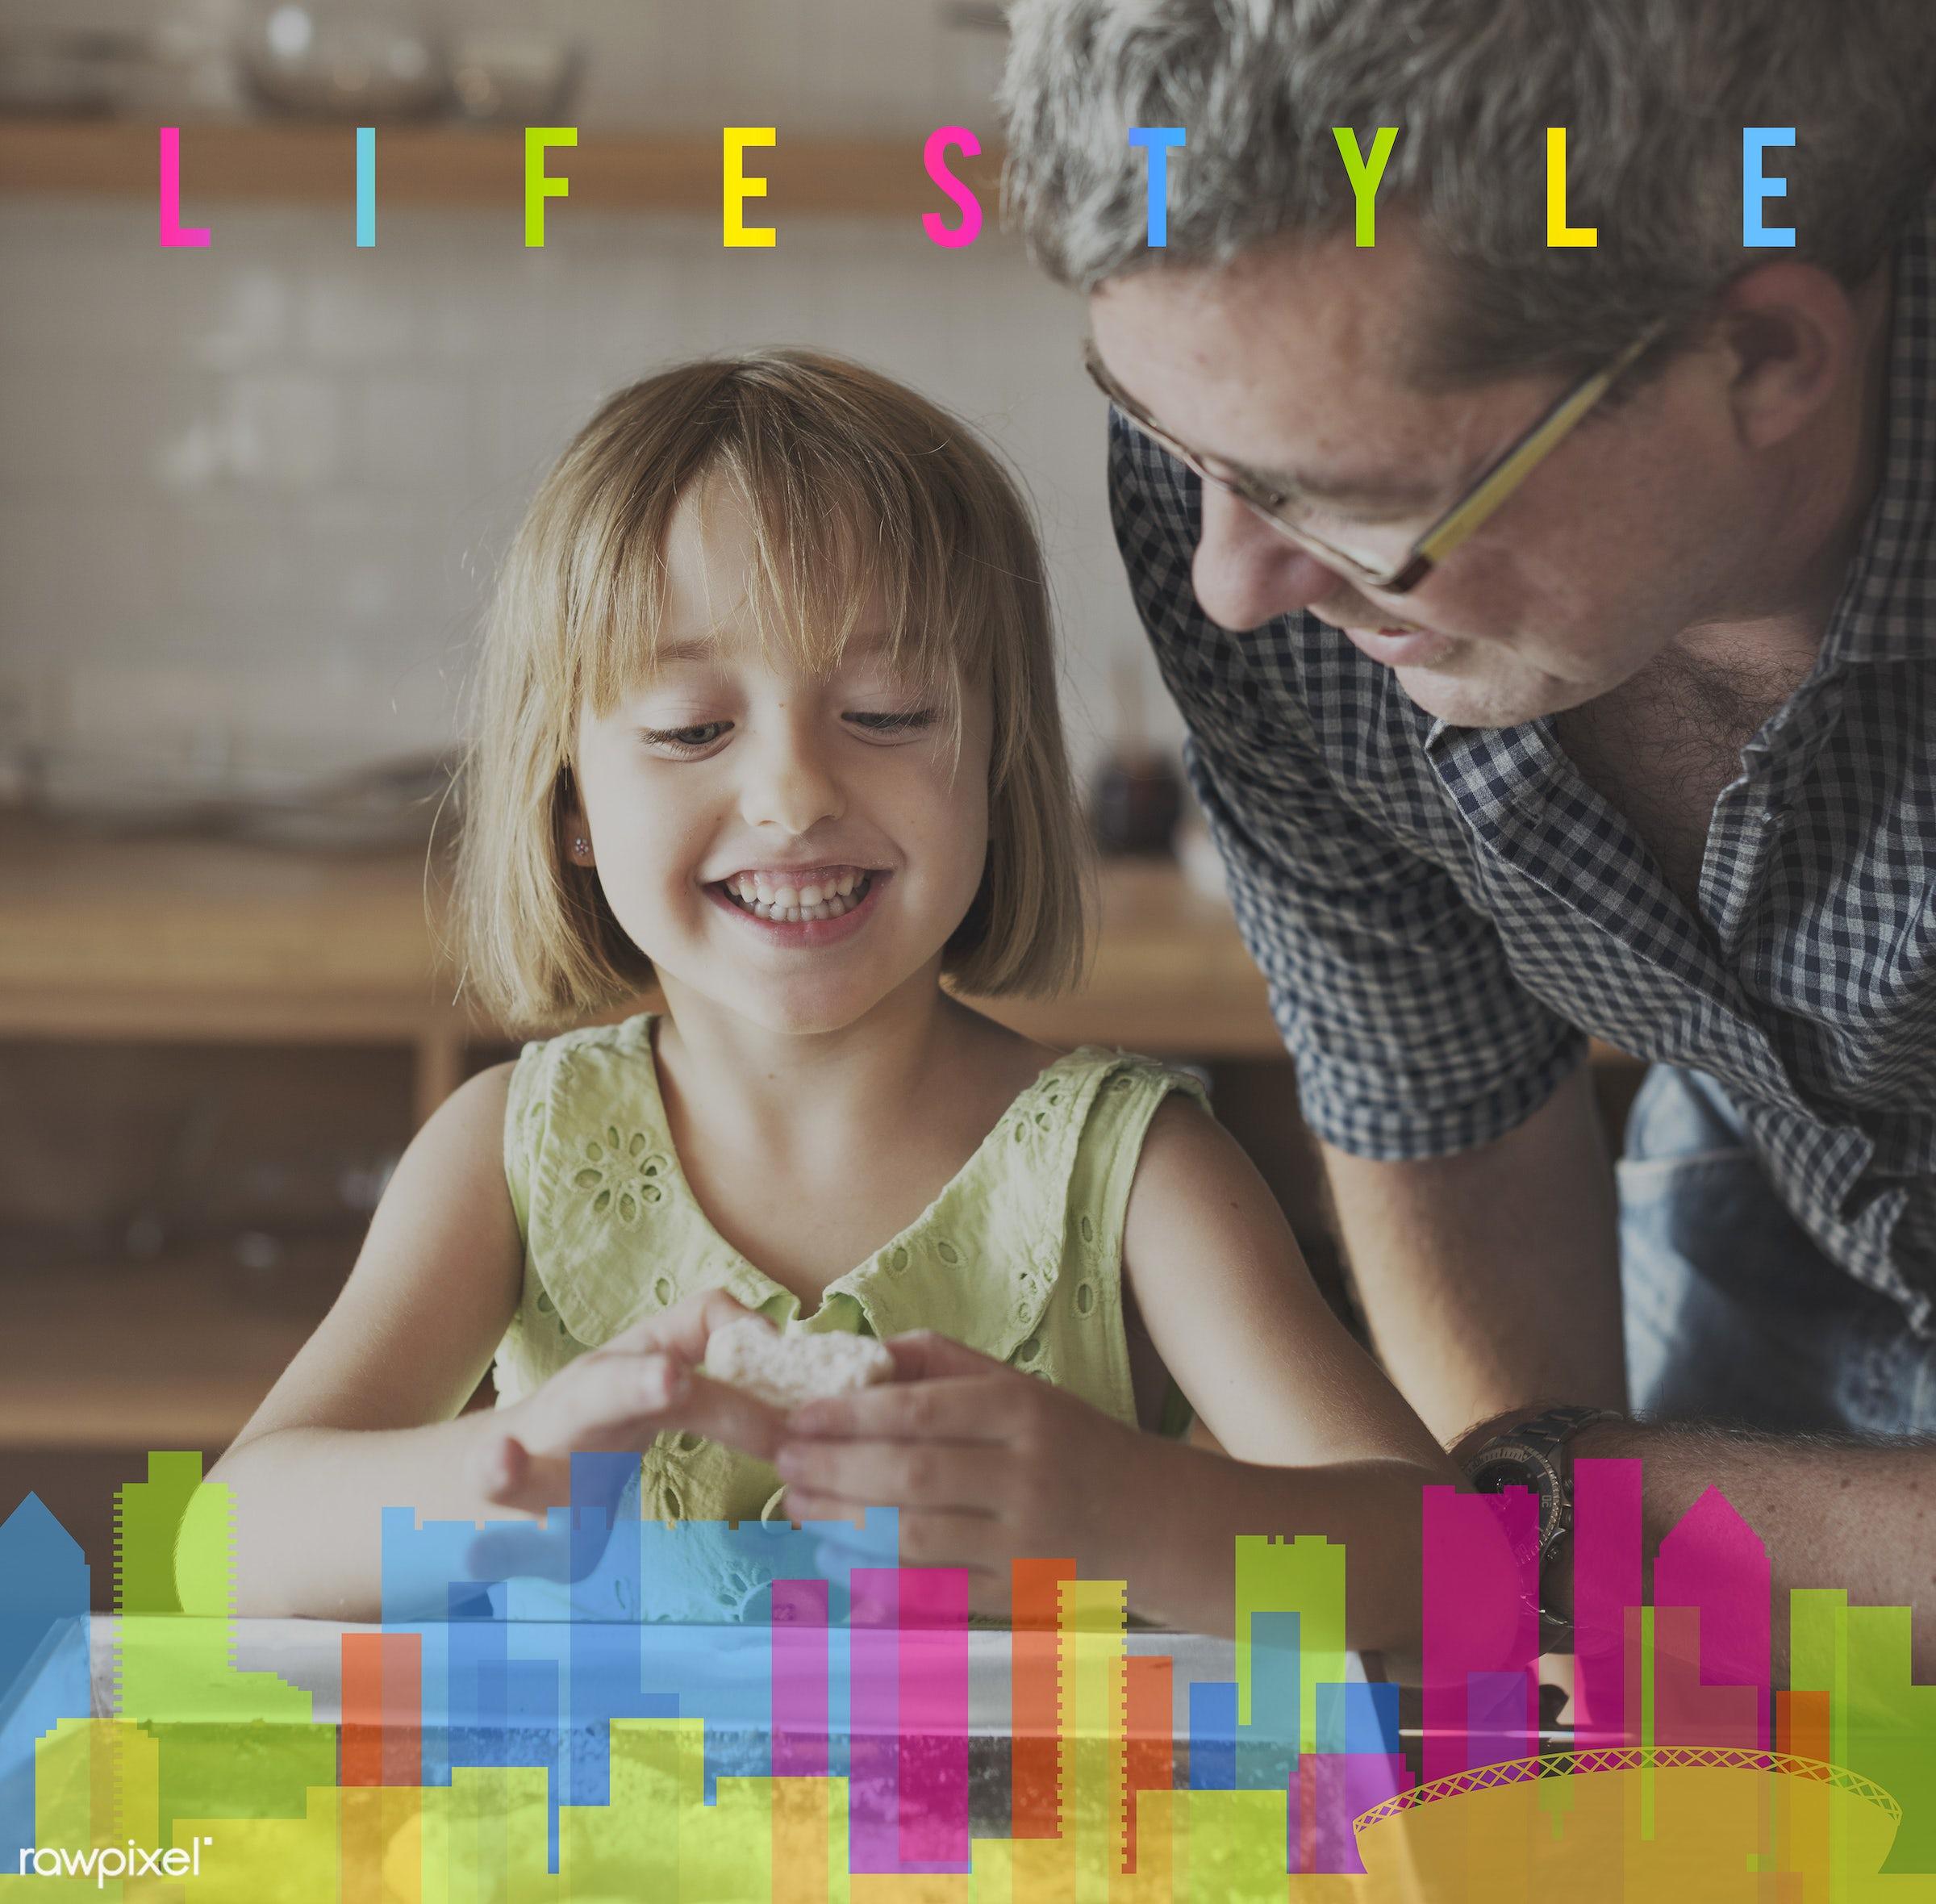 bake, baking, behaviour, bonding, cheerful, childhood, conduct, cookies, cool, culture, customers, cute, enjoy, enjoyment,...